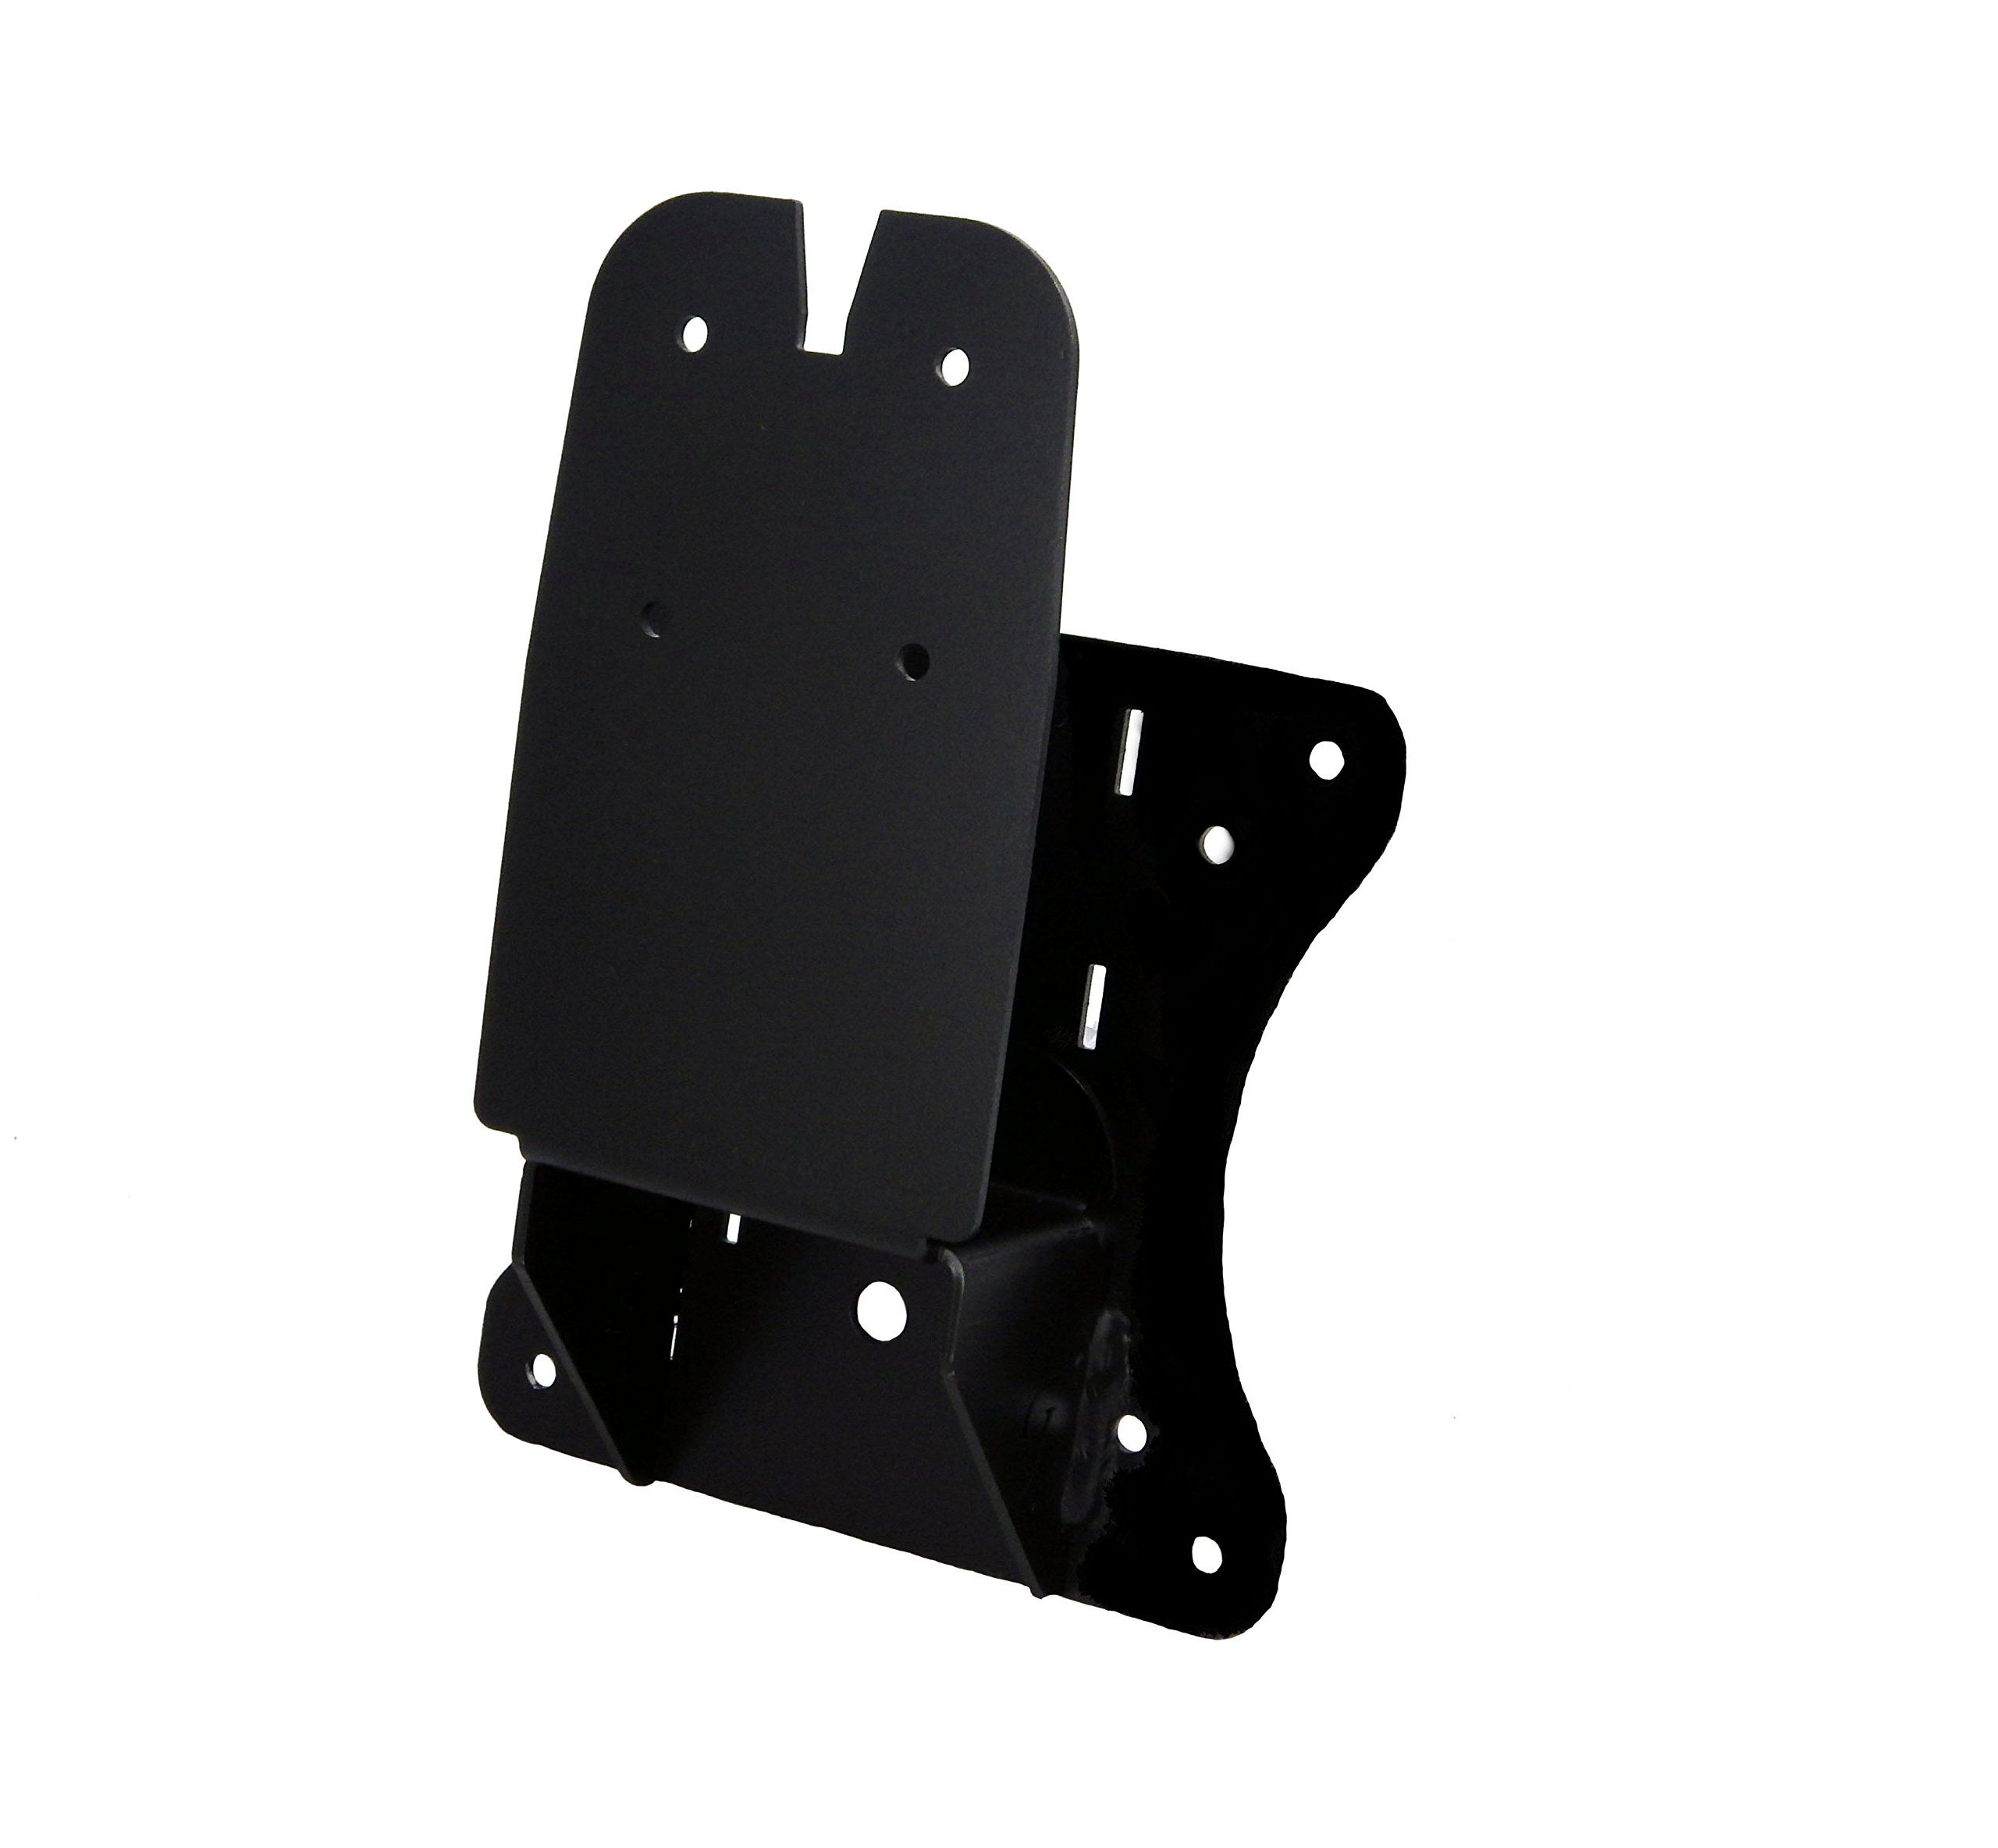 Dell Vesa Bracket Adapter Wall Mount For Dell Sx2210